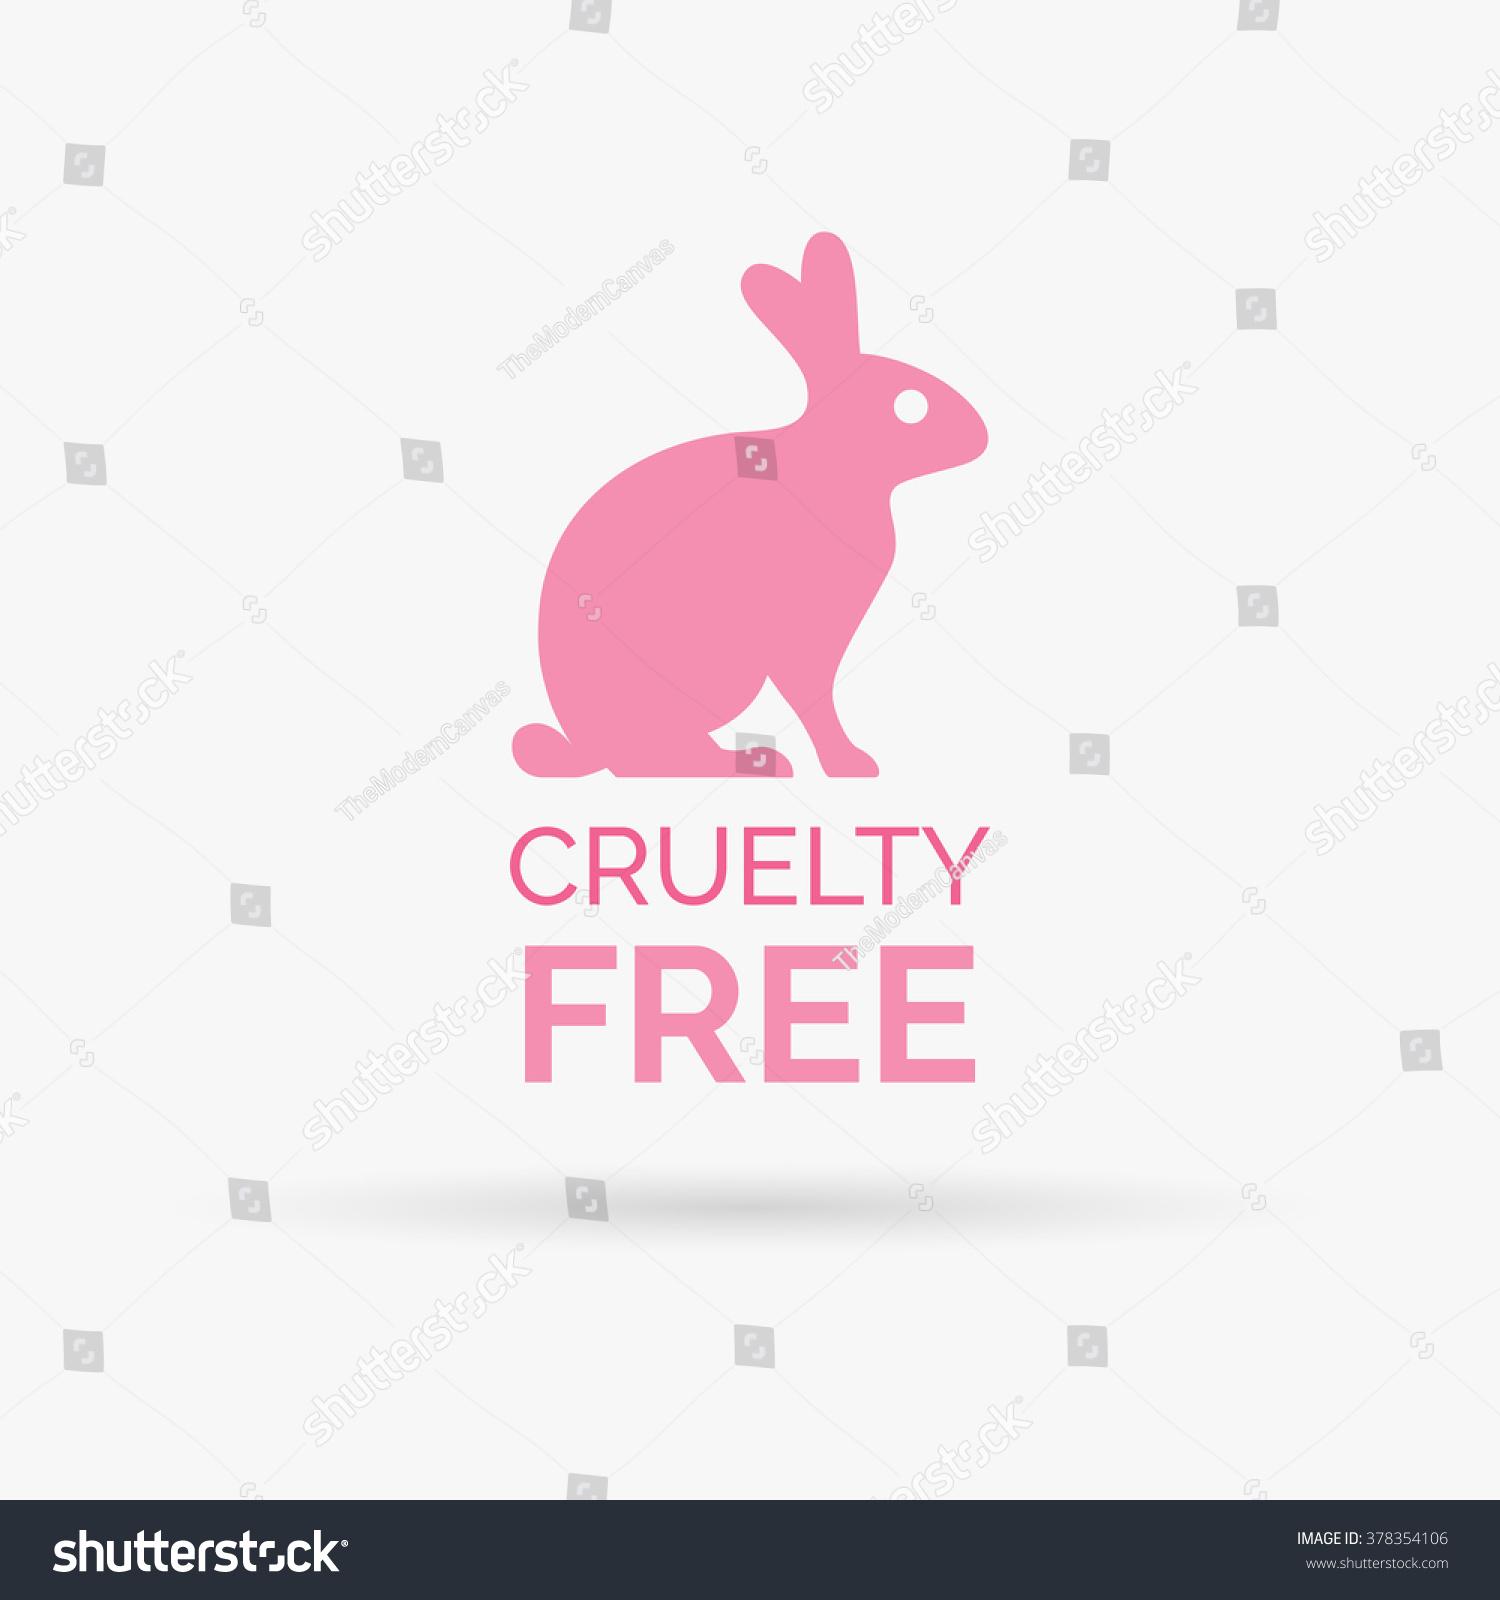 animal cruelty free icon design symbol stock vector 378354106